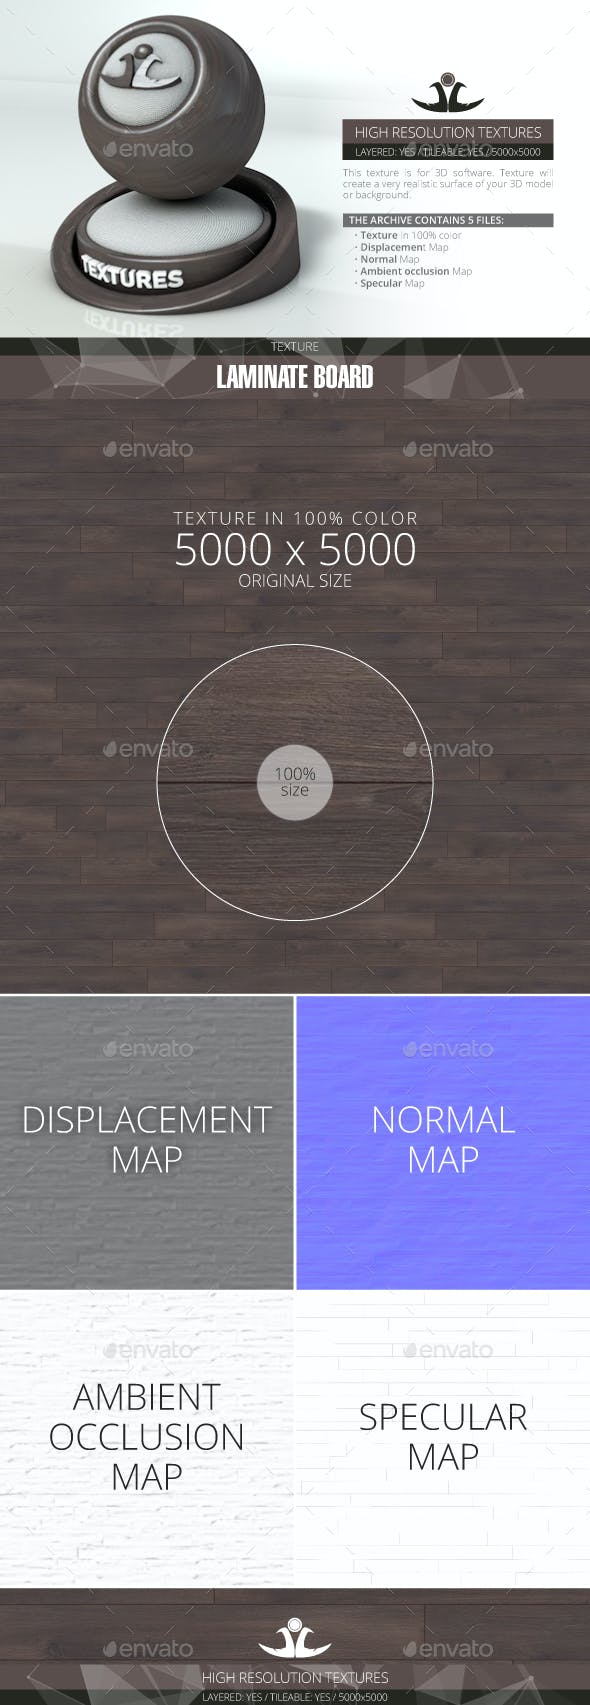 Laminate Board 42 - 3DOcean Item for Sale